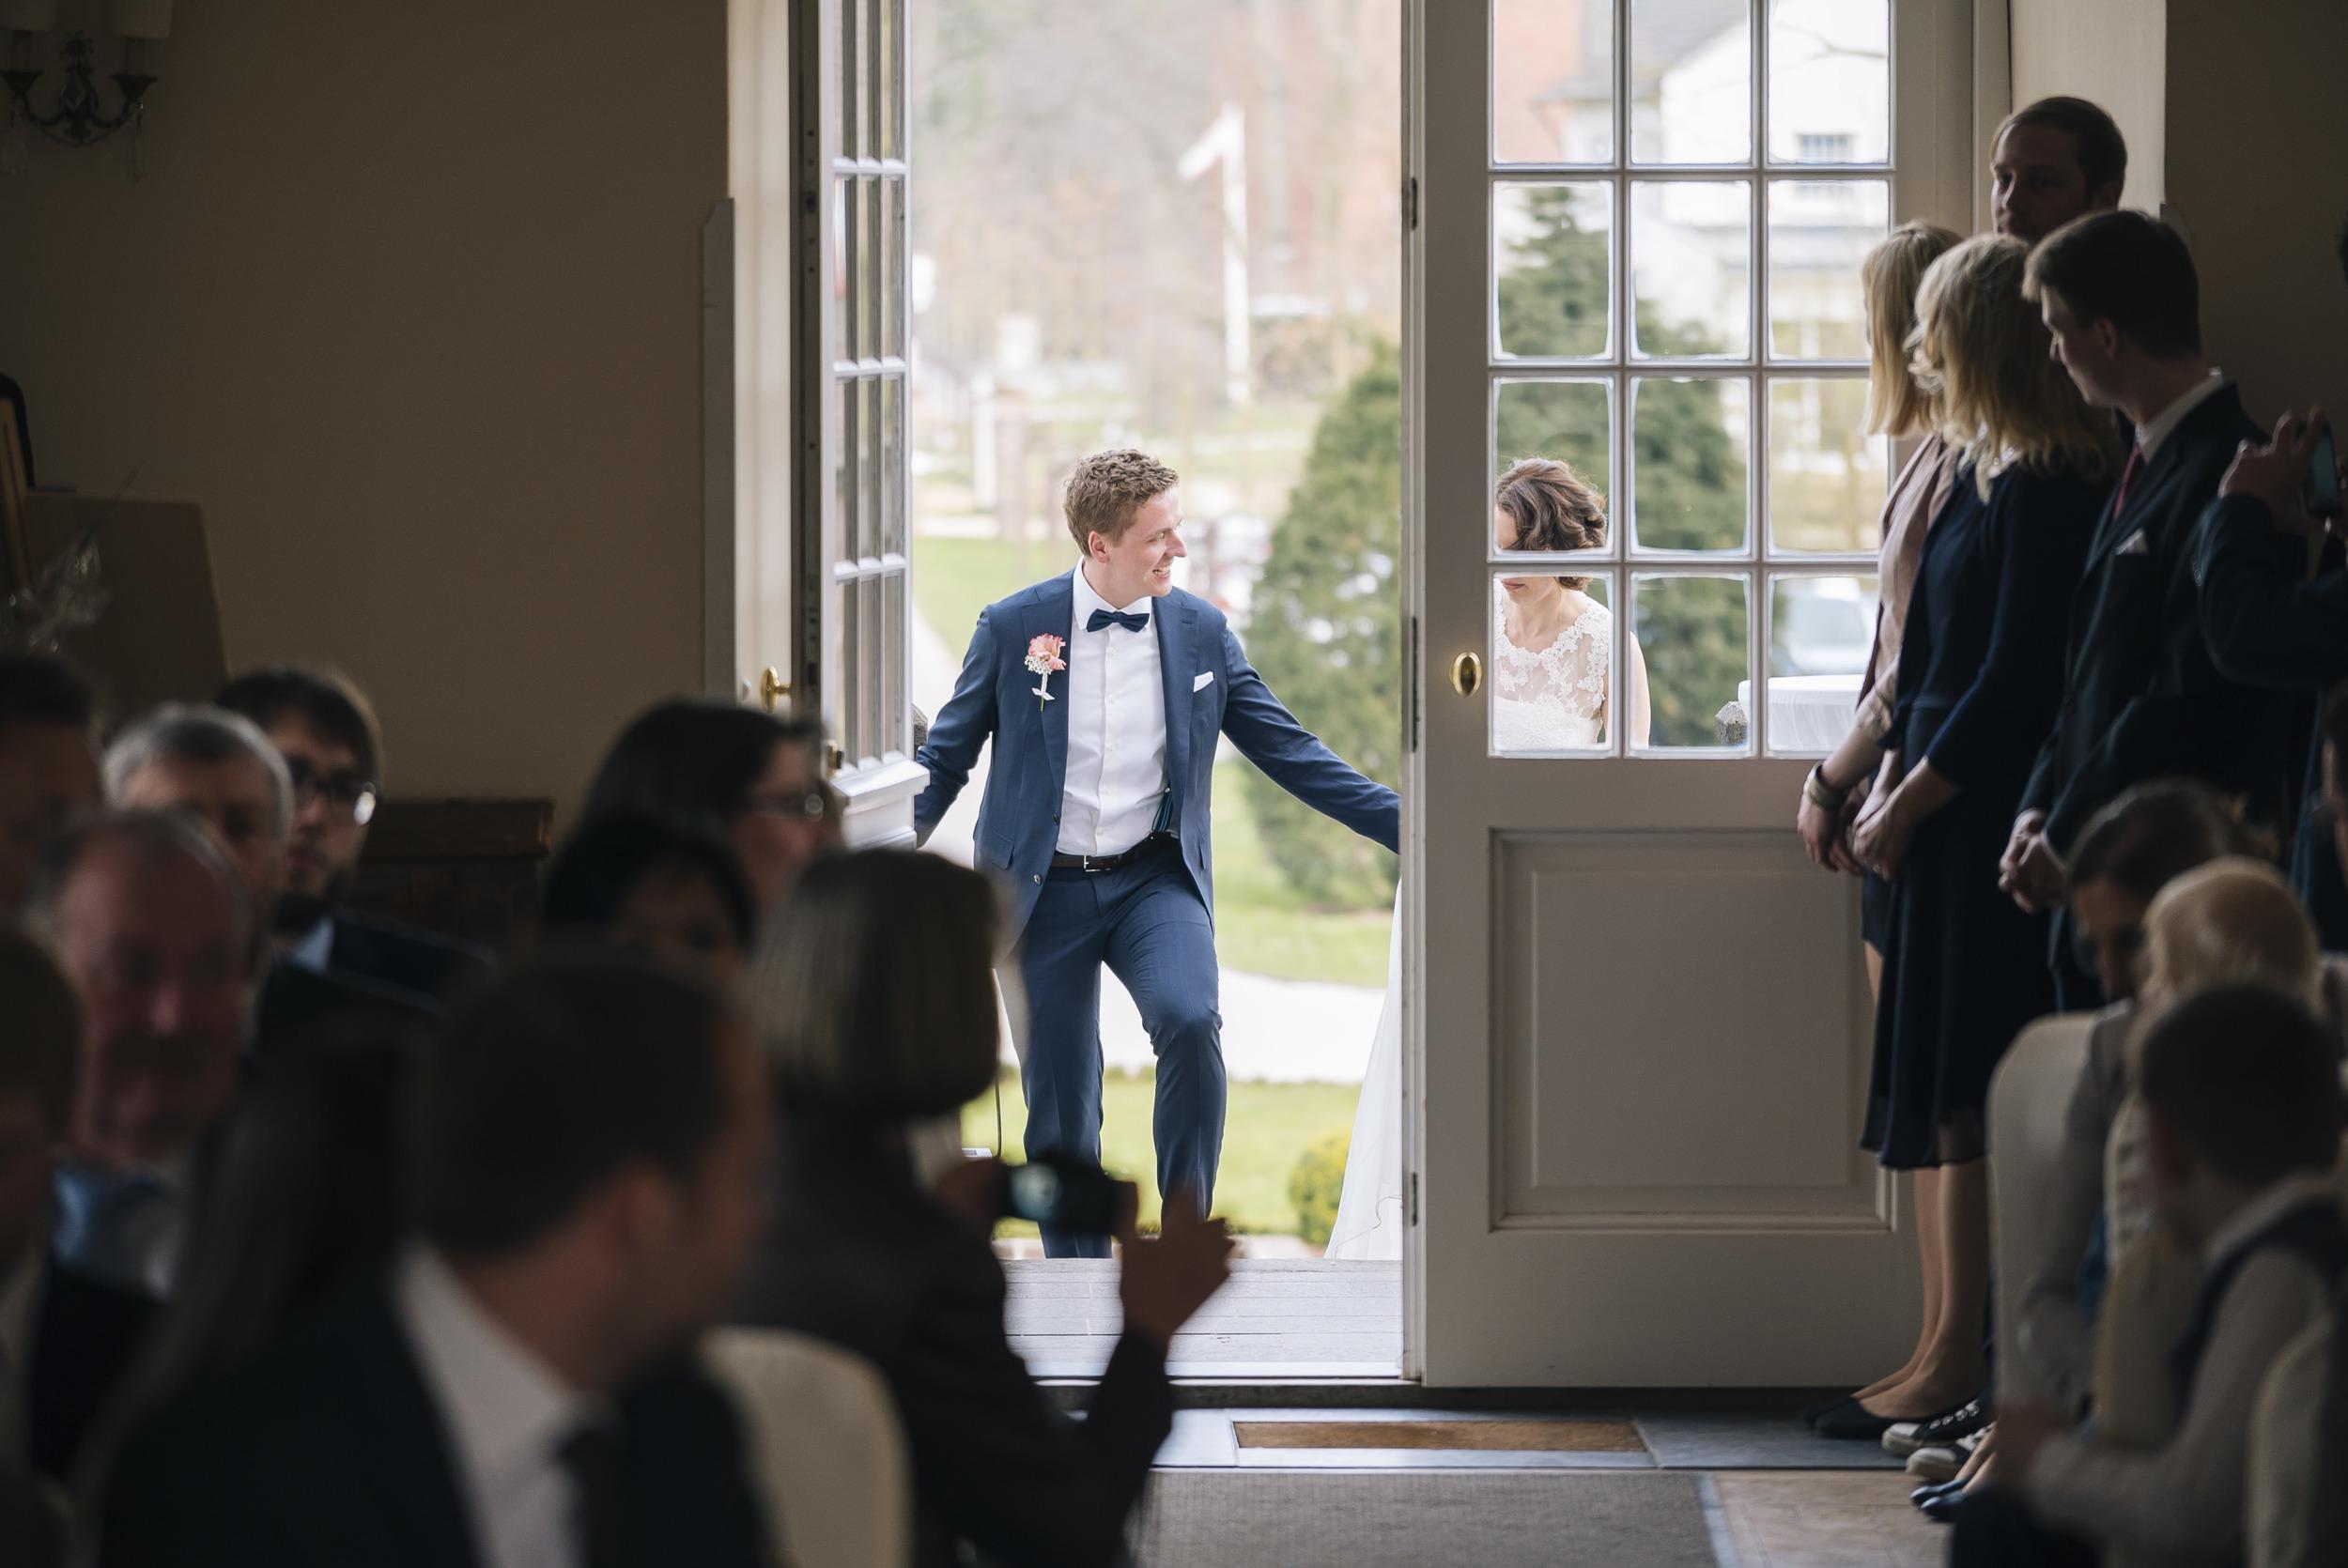 Hochzeitsfotograf-Schlossruine-Hertefeld-Weeze-062.jpg